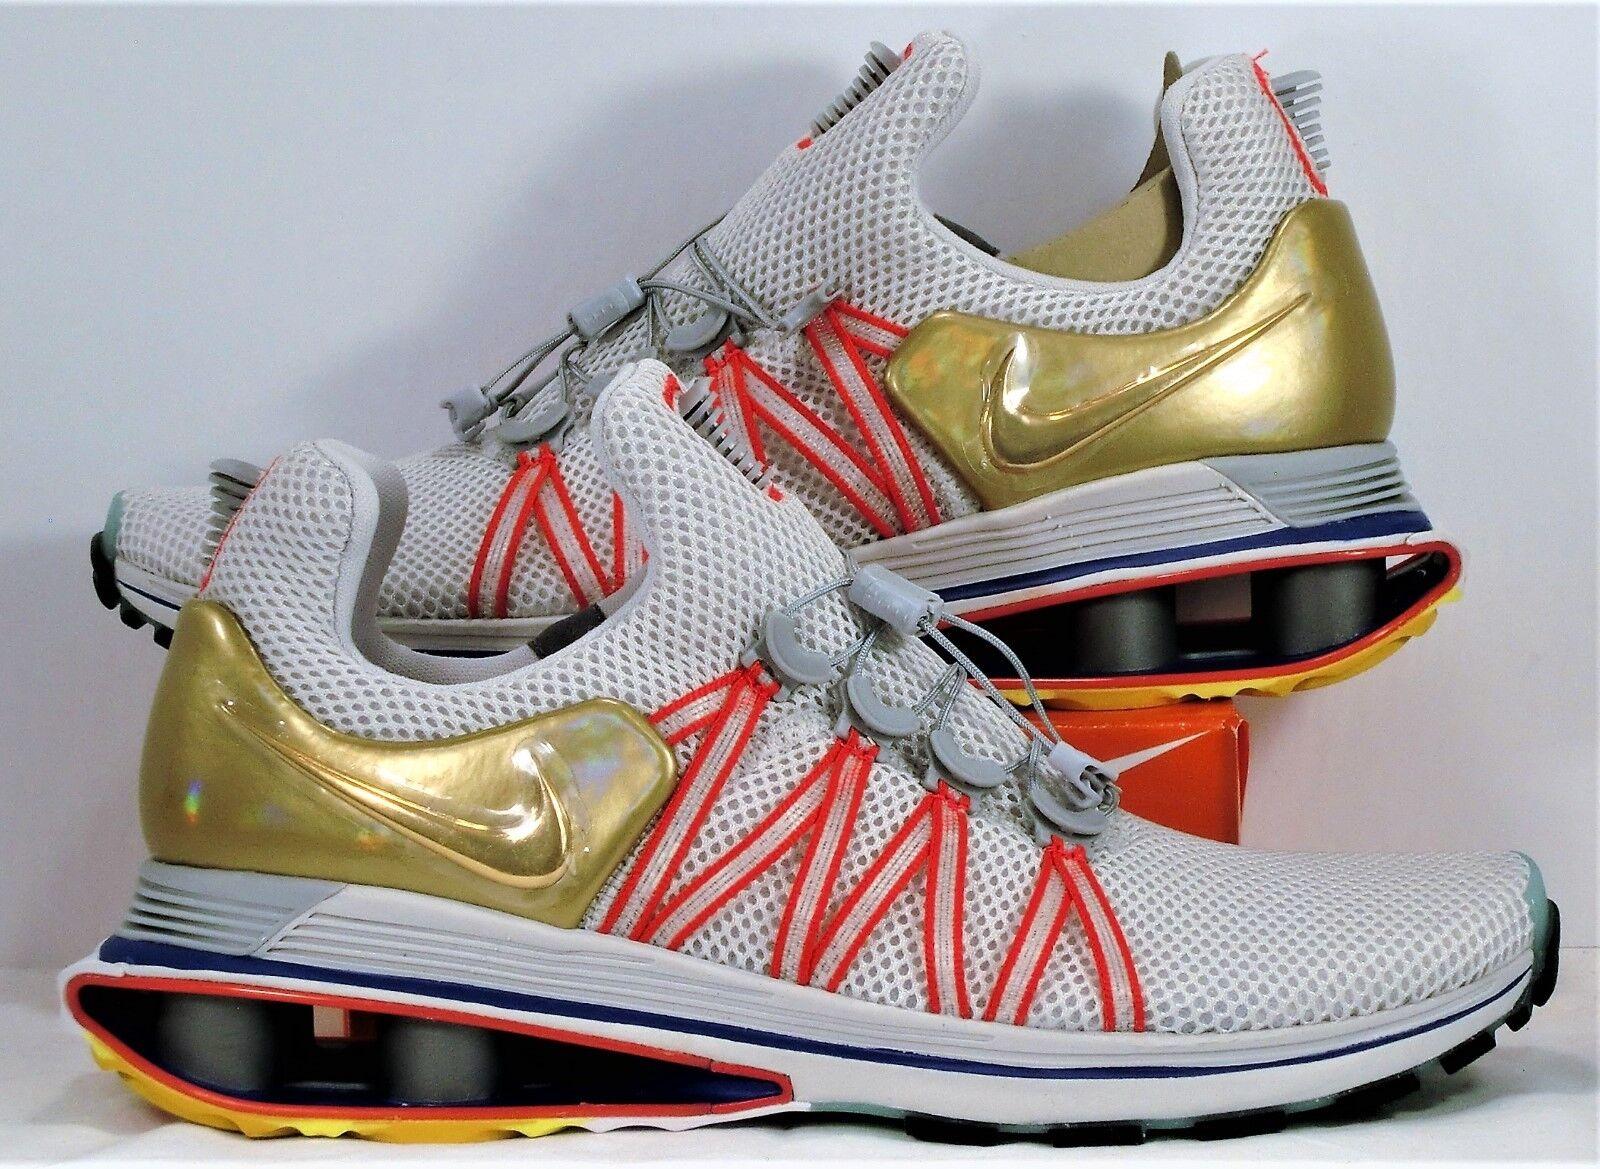 Nike Shox Gravity Vast Grey & Metallic gold Running shoes Sz 11 NEW AQ8553 009